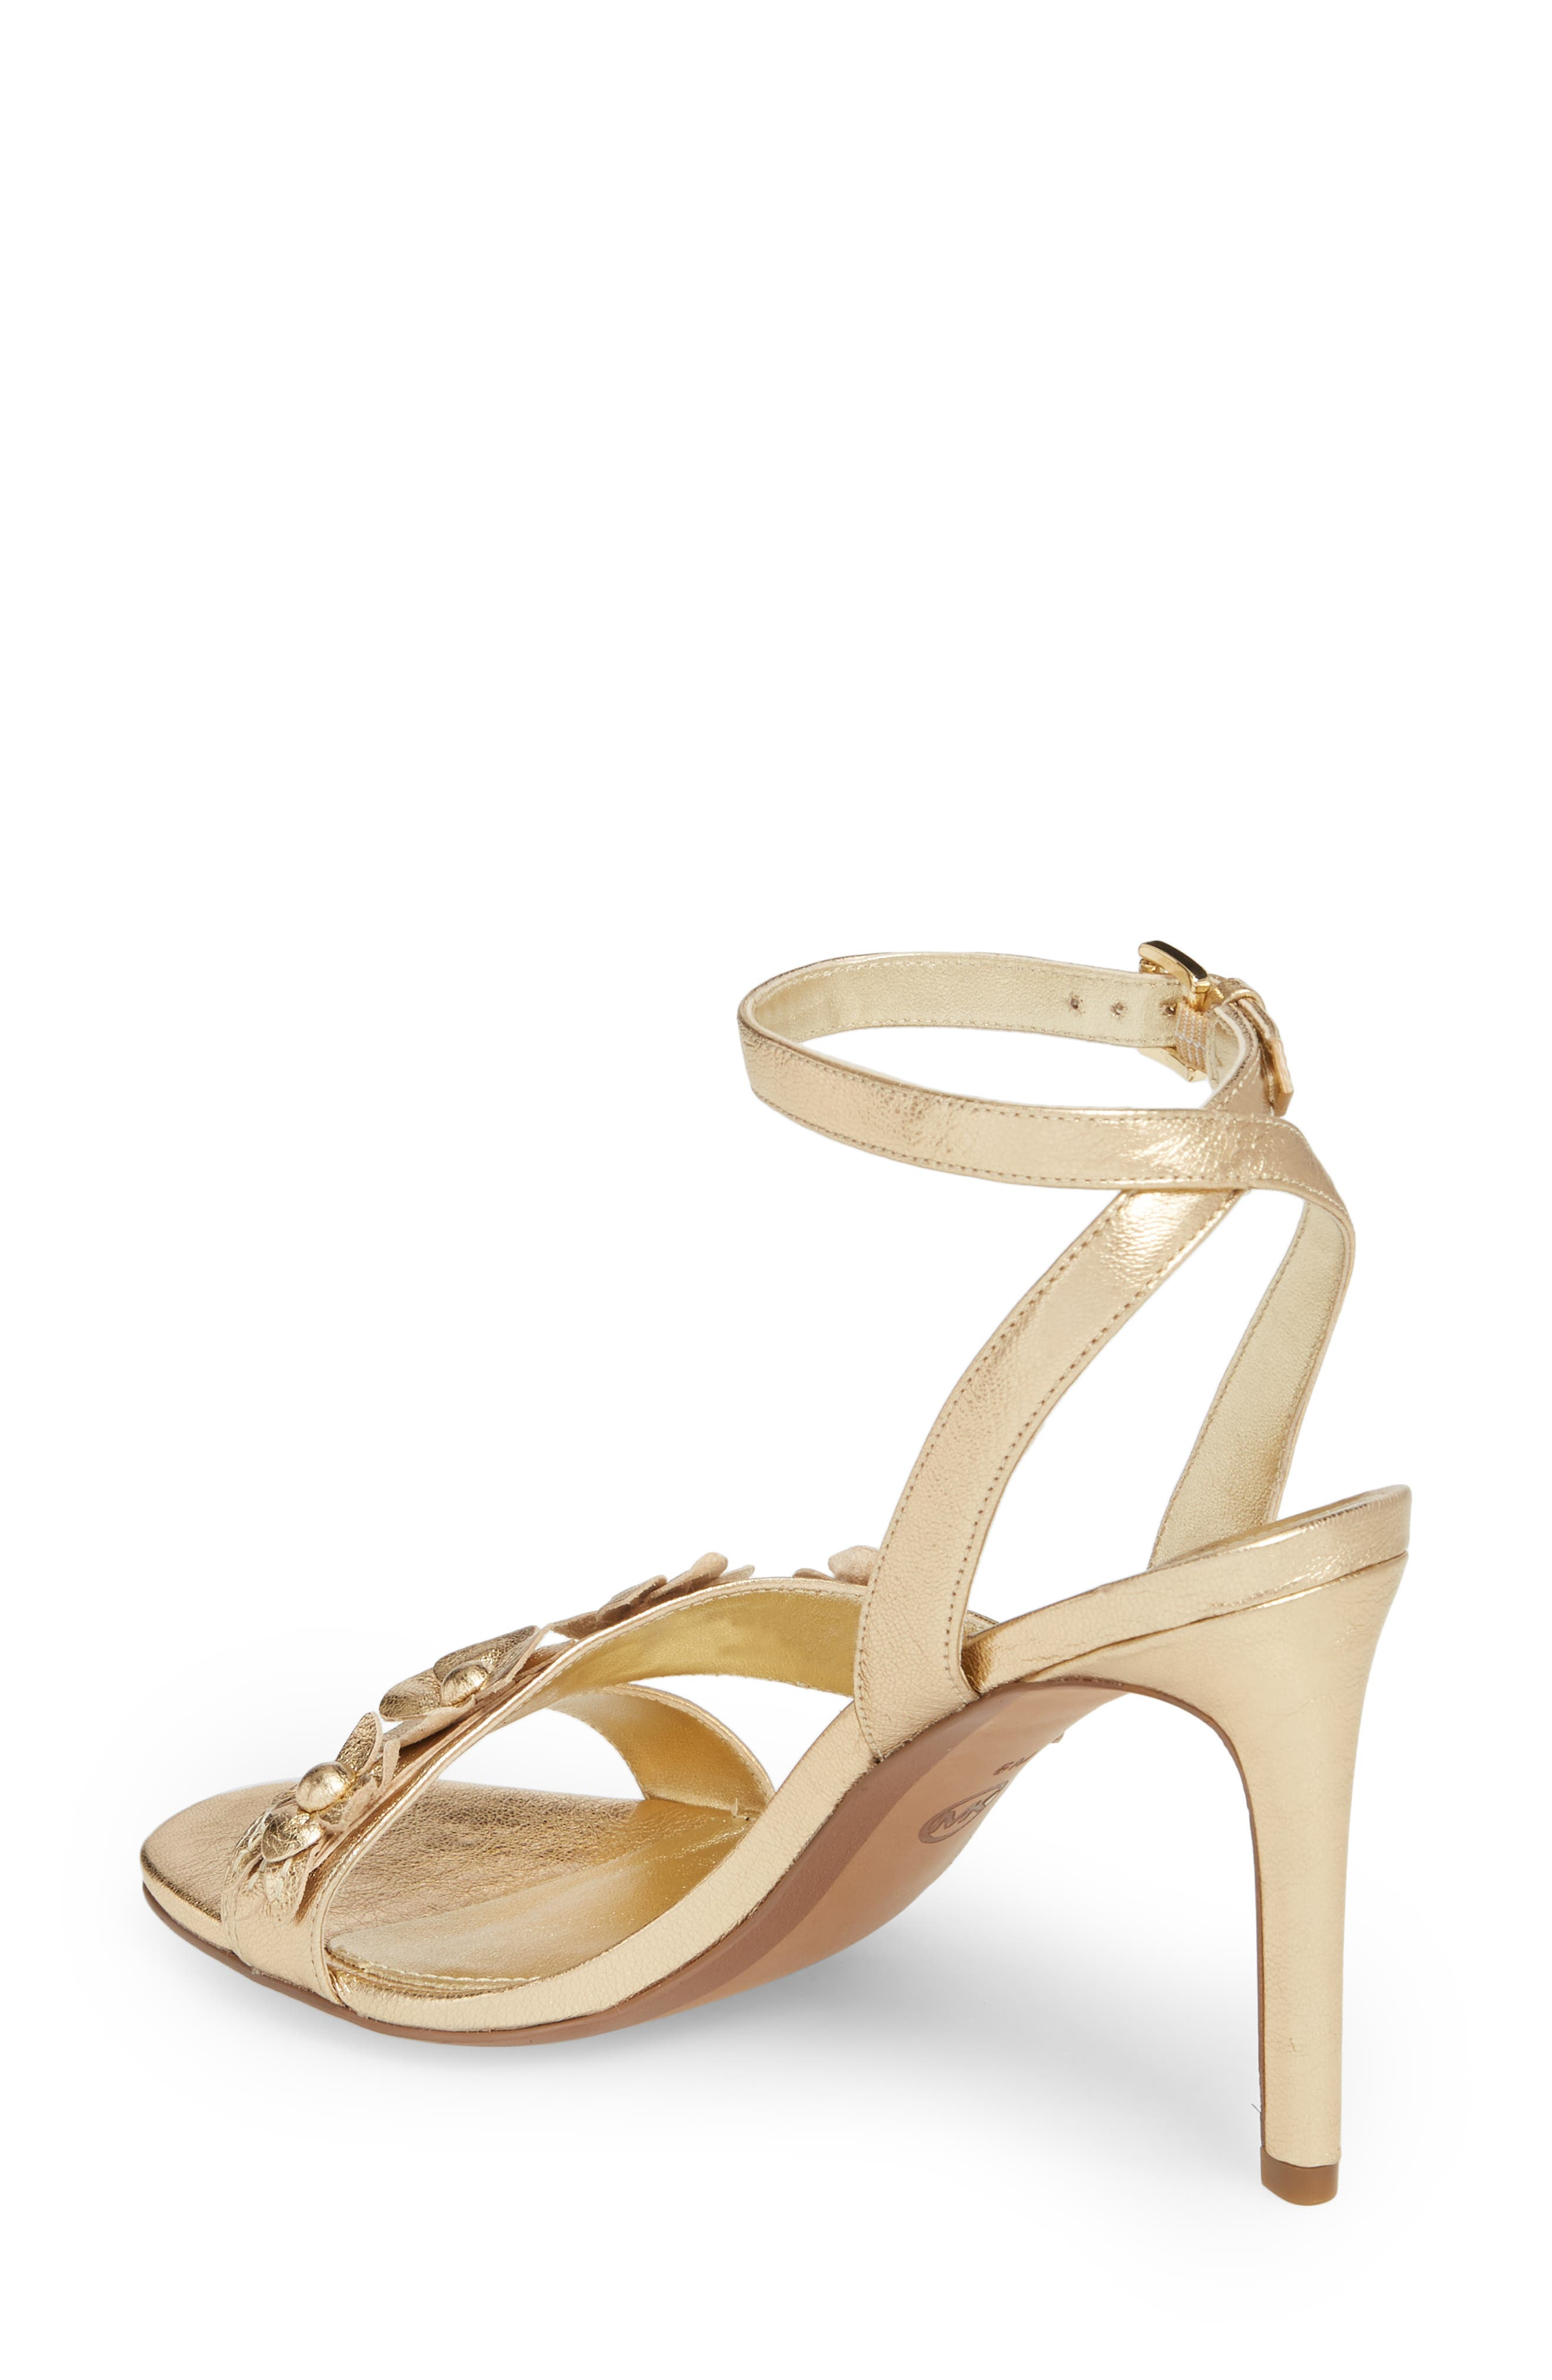 Tricia Sandal,                             Alternate thumbnail 2, color,                             Pale Gold Leather